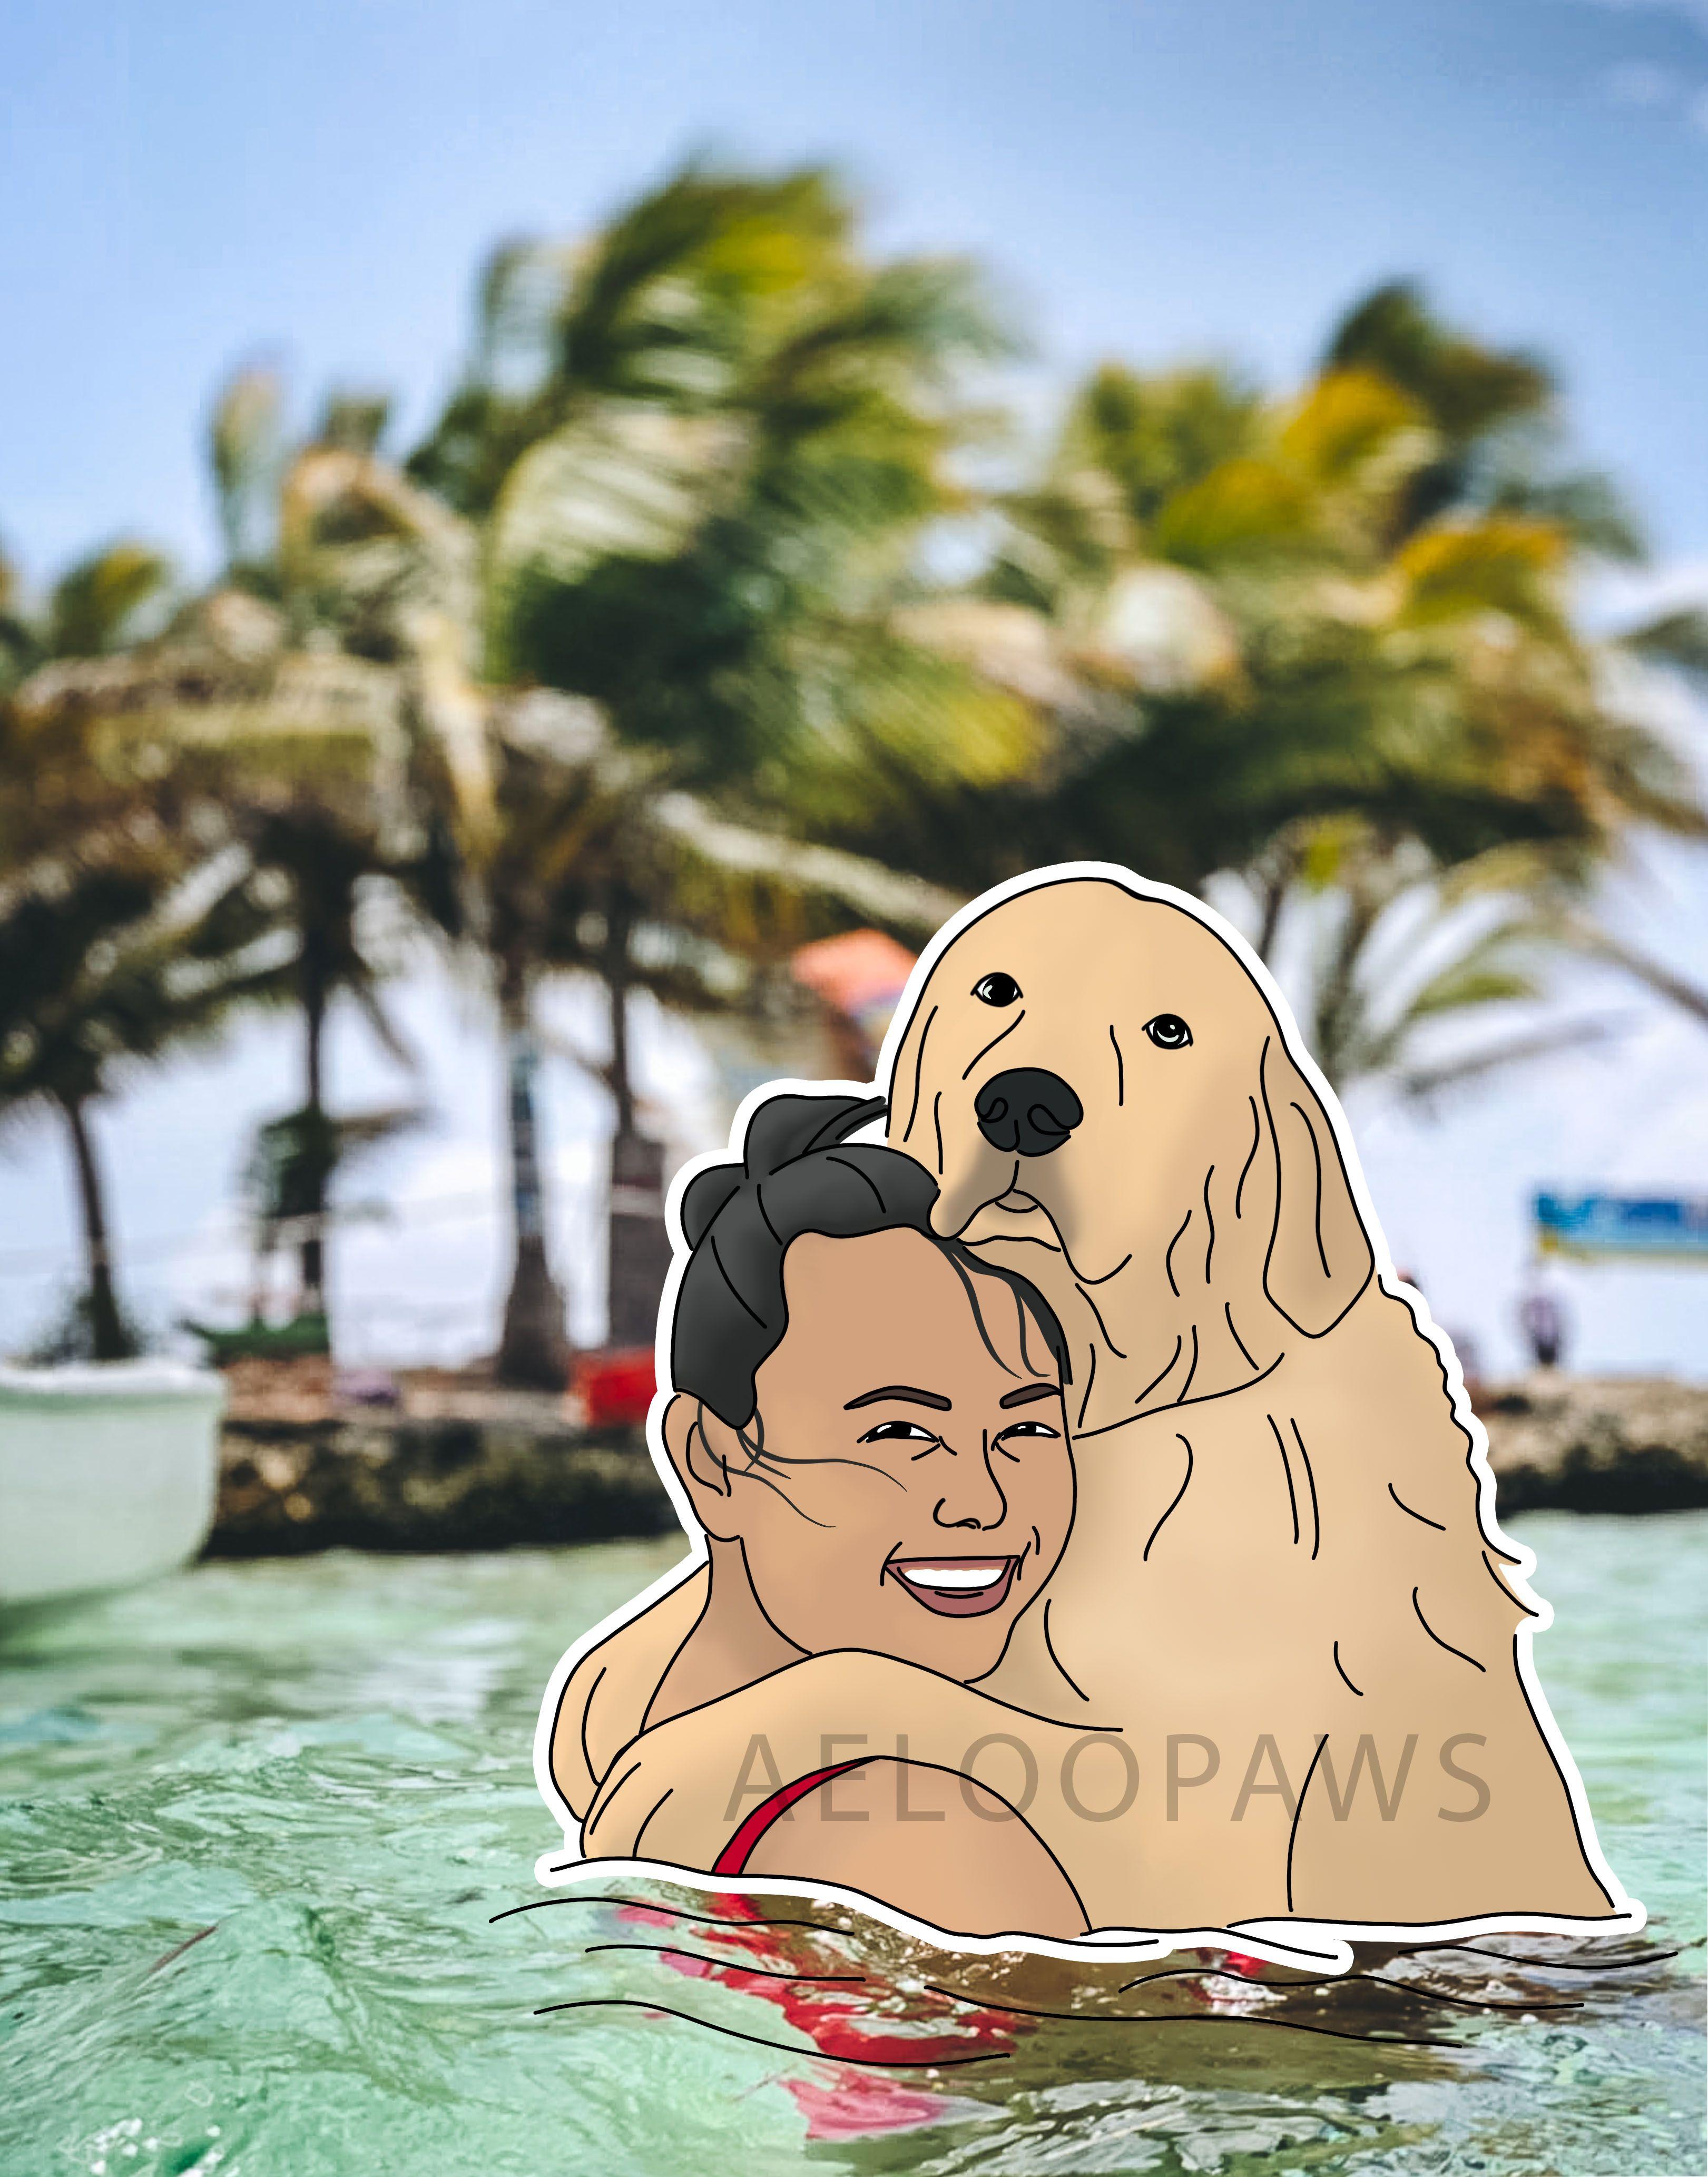 #dogsofinstaworld #dogslover #dogsofinstagram #staywild #dogoftheday #dogsdaily #eastonindoors #mydogist #mainvision #retrieverstagram #weeklyfluff #creatingfromhome #folkgood #goldenretrieversofinstagram #exclusiveshots #dogsofbark #photographydaily #goldenretrieverworld #eastonofthewild #goldenretrieverlovers #earthfocus #goldensofinsta #photooftheday #NikonCA #love #takemoreadventures #goldenretrievertoday #instagood #collectivelycreate⠀